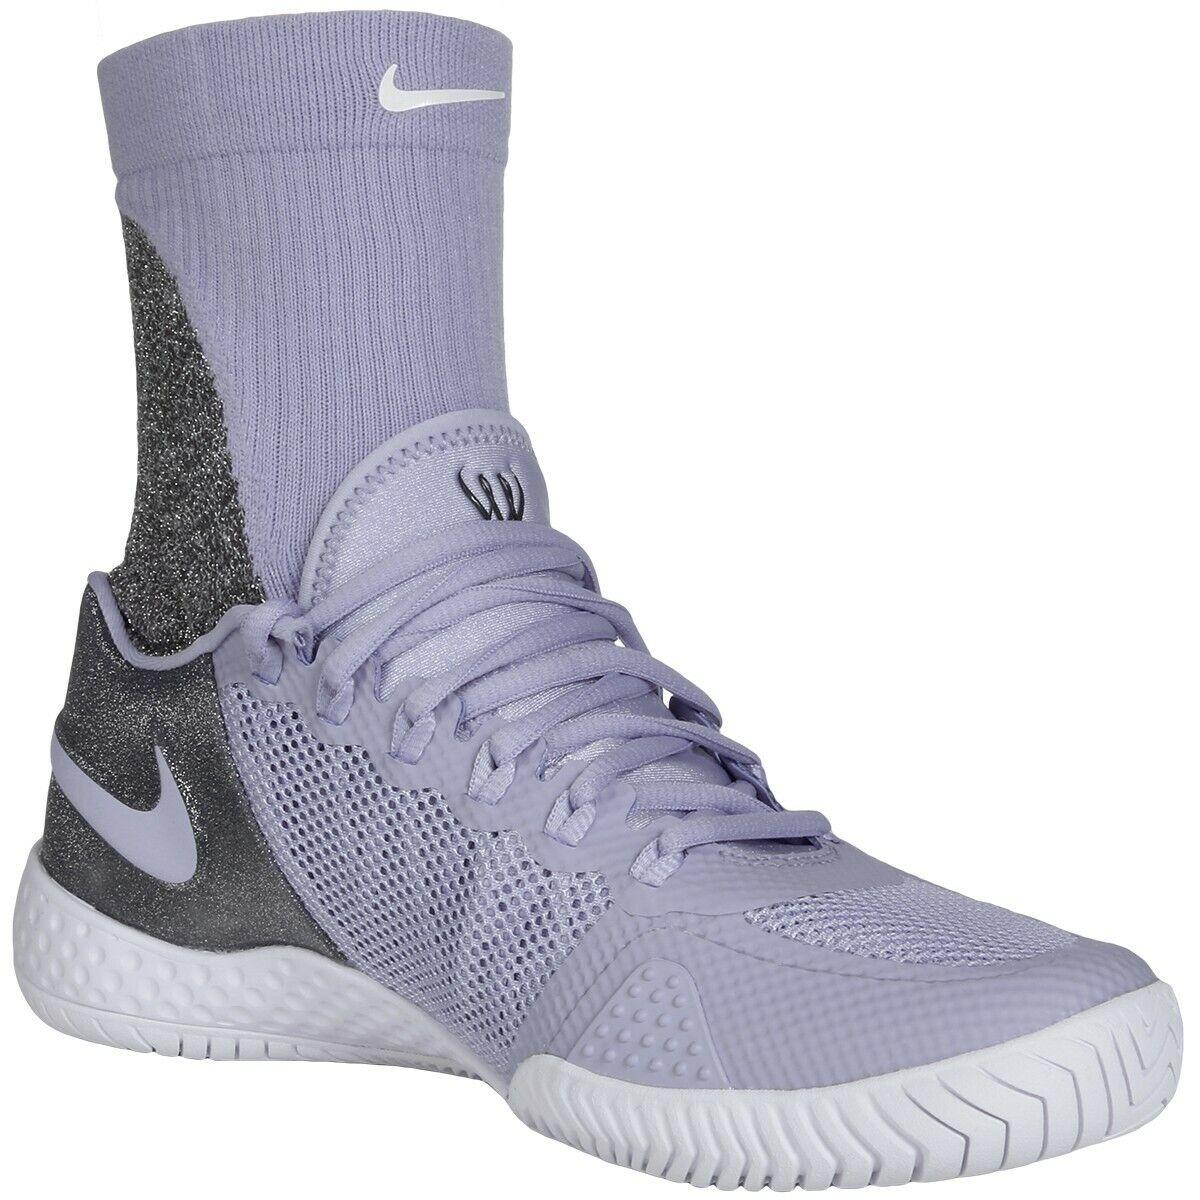 Wmns Nike Flare 2 HC Serena Williams Tennis UK 5 EUR 38.5 Purple Rise AV4713 500